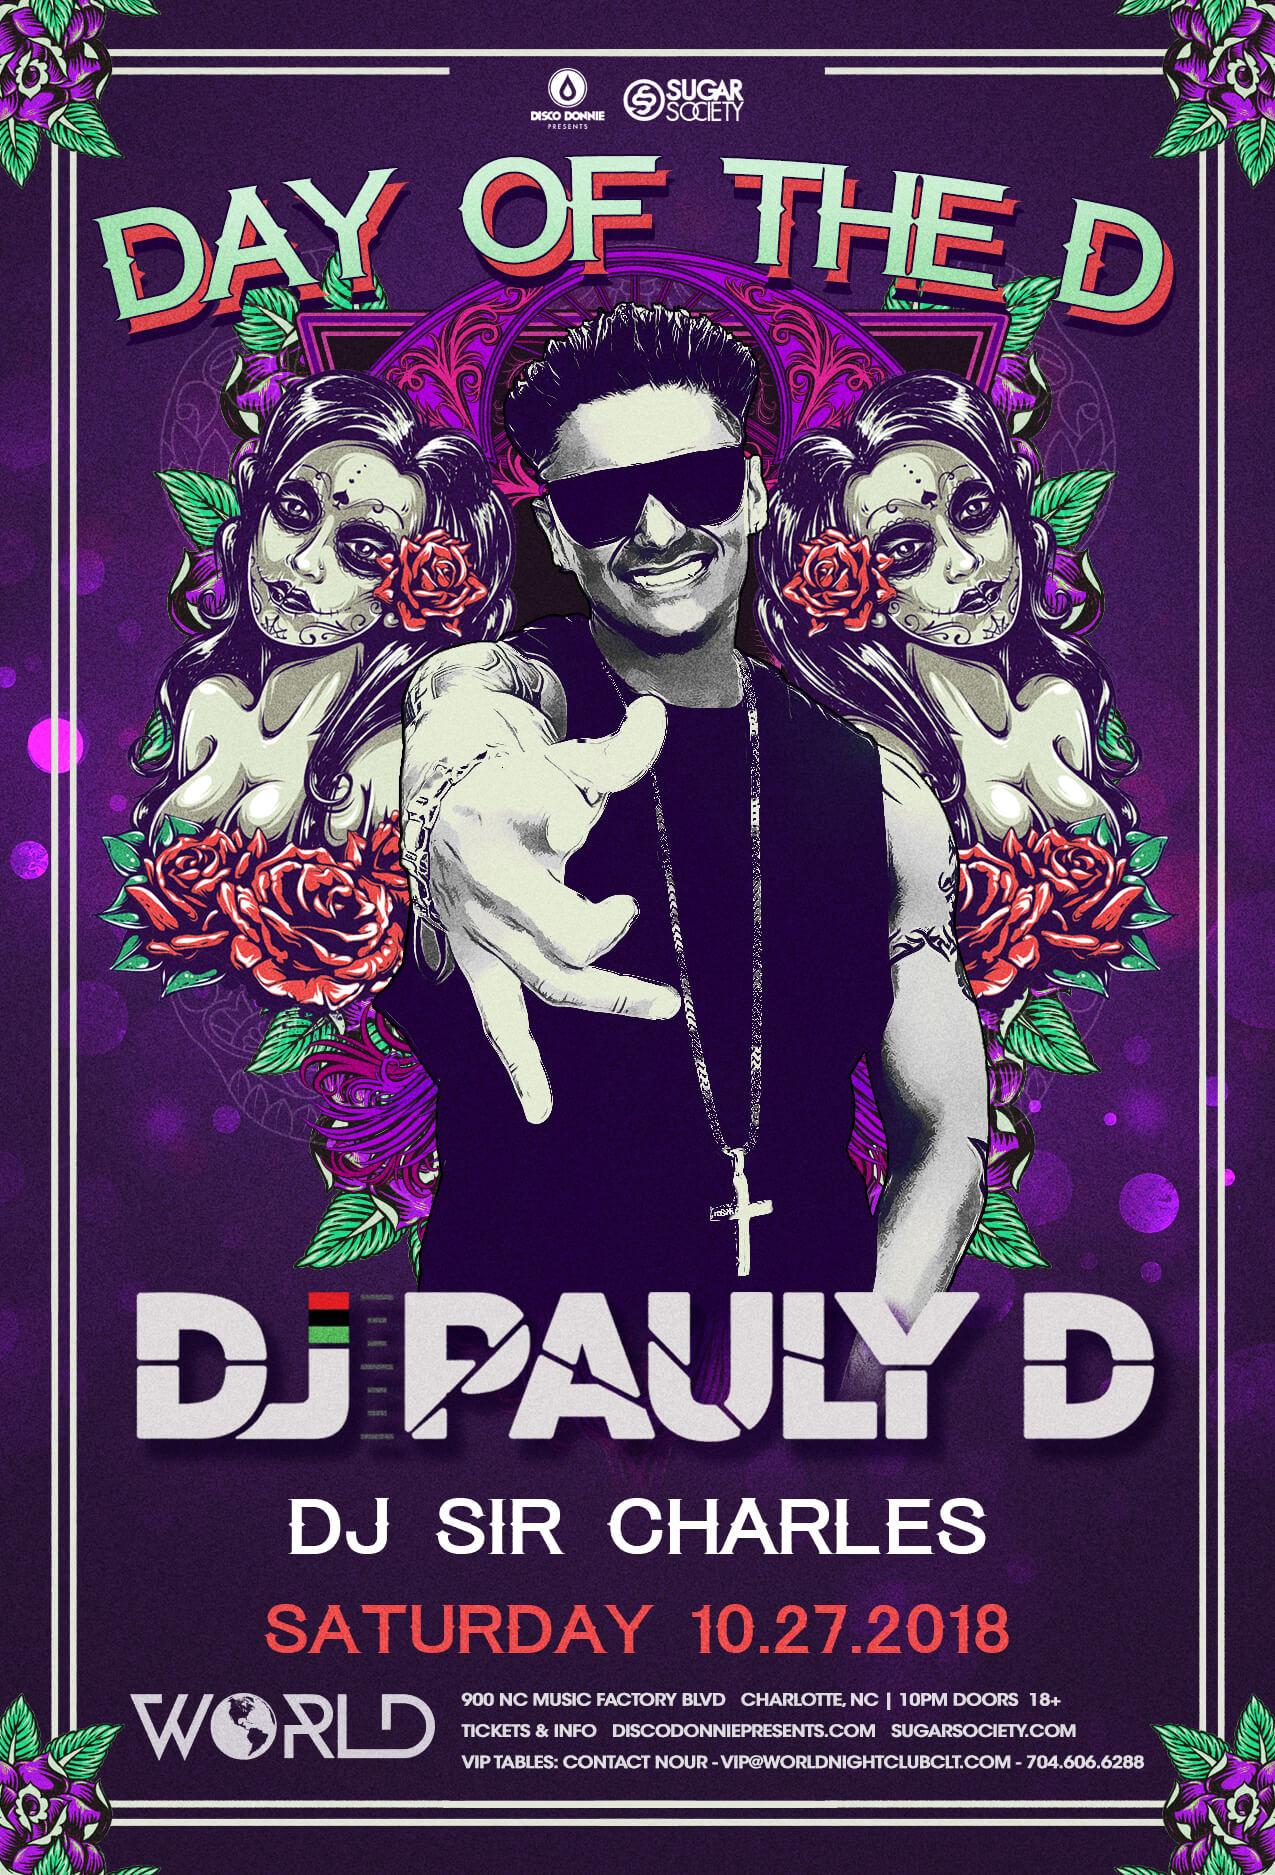 DJ Pauly D in Charlotte